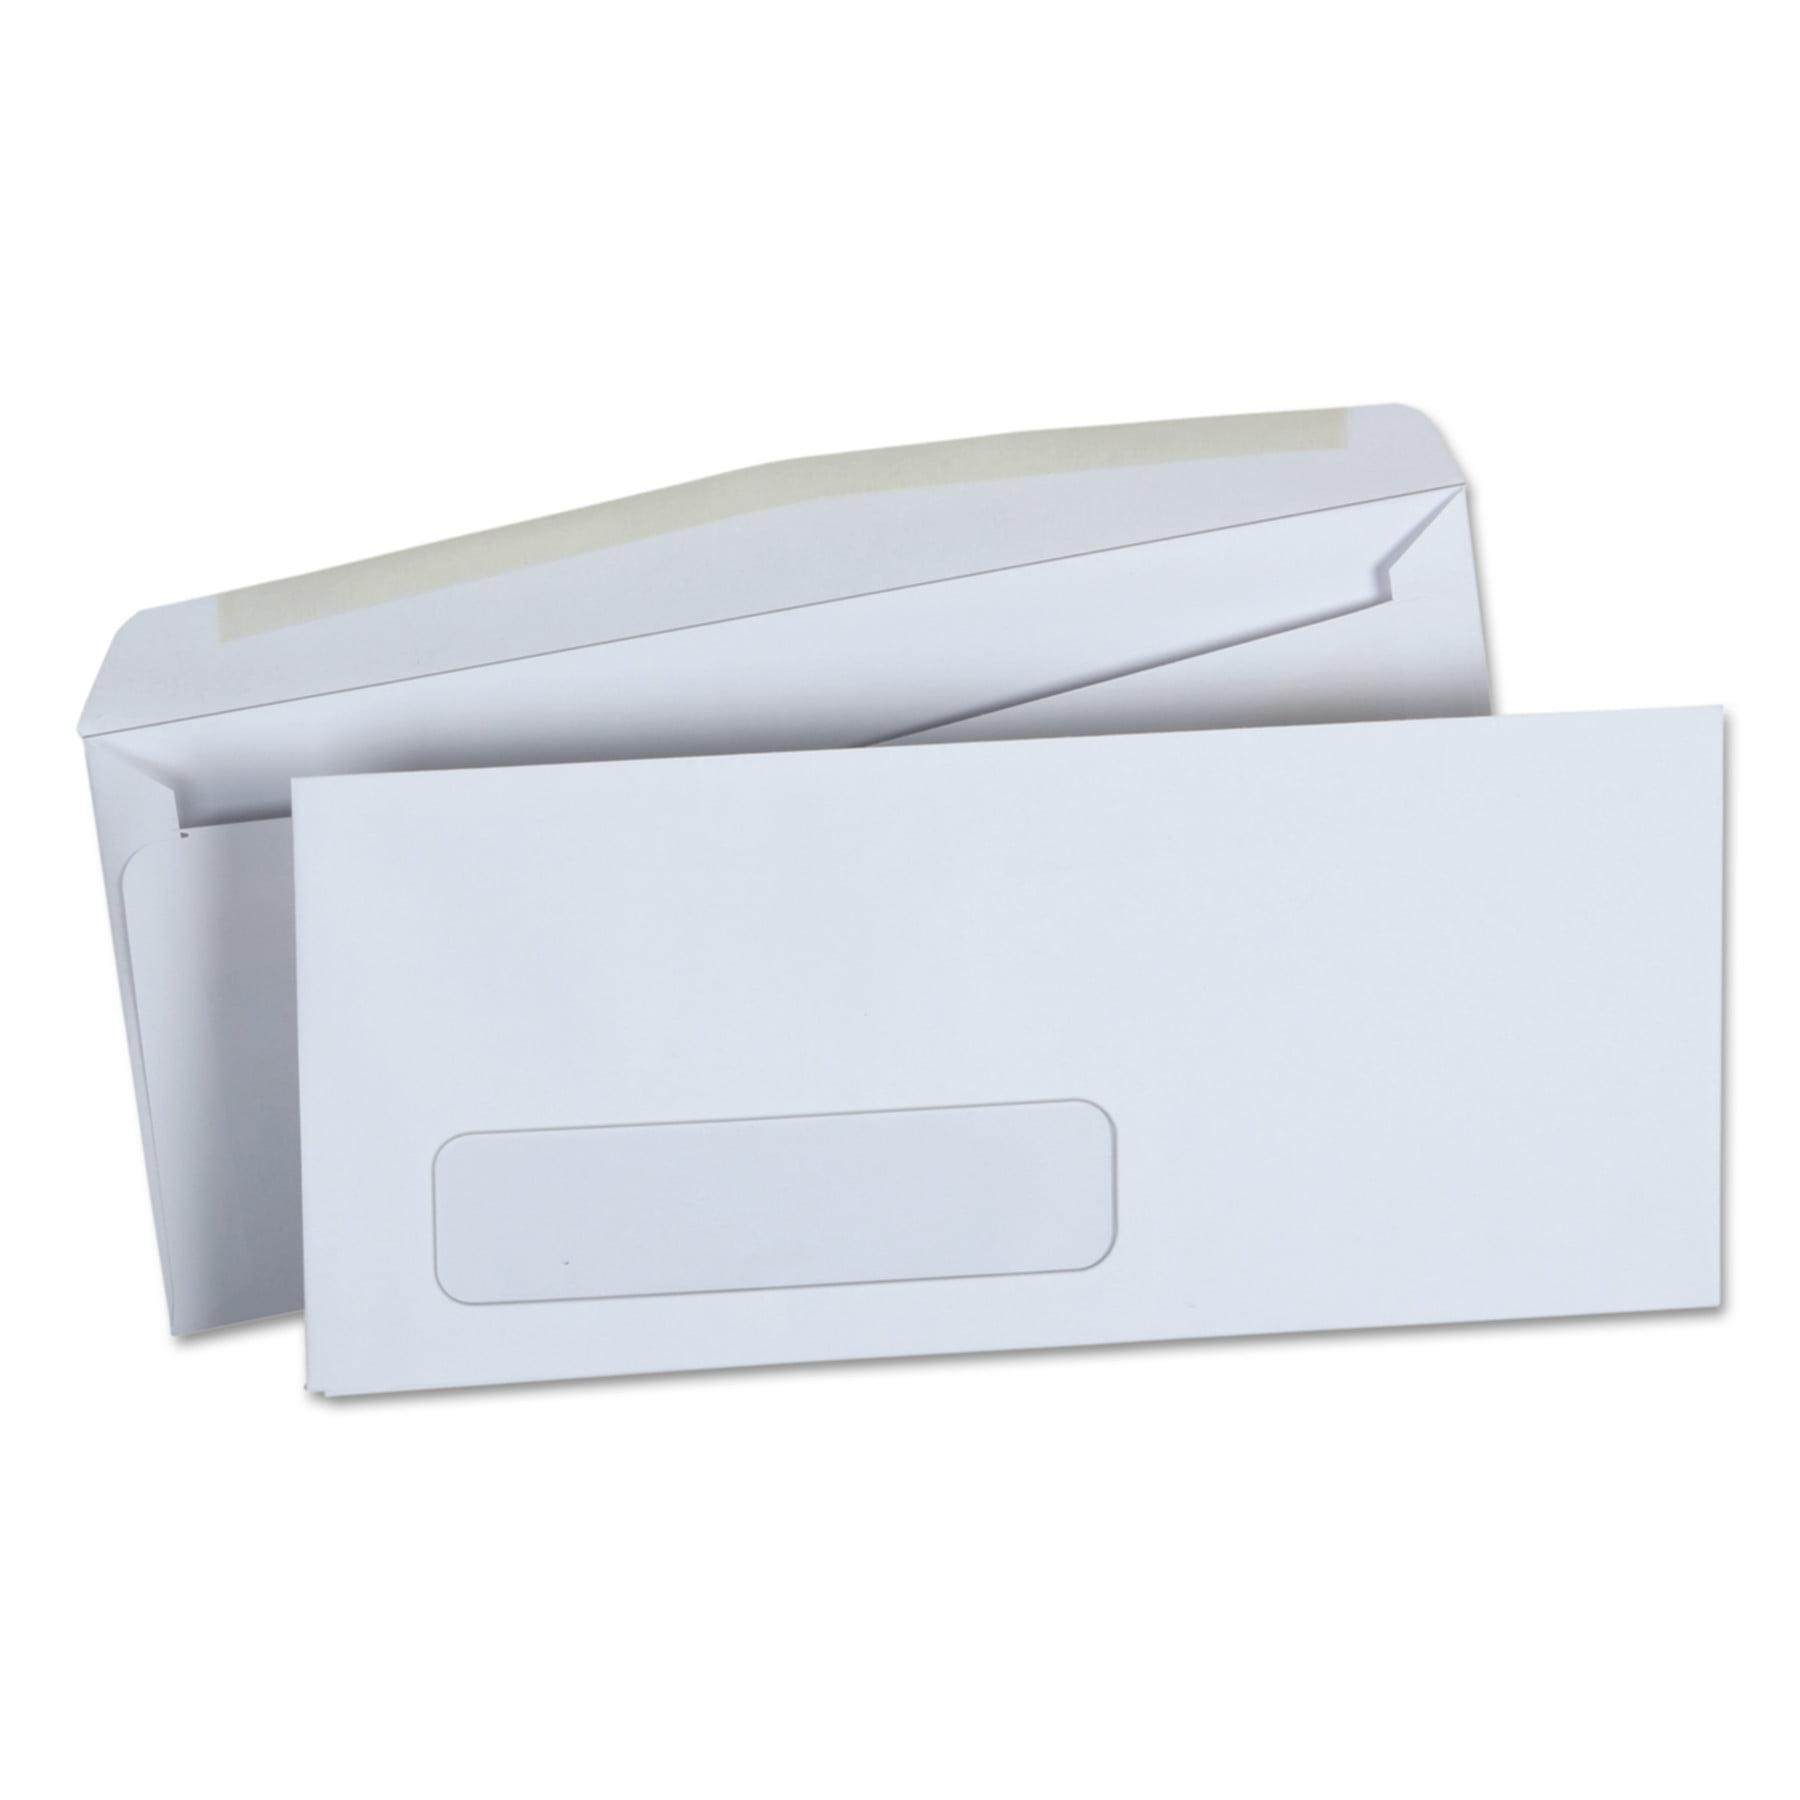 Universal Window Business Envelope, Side, #10, 4 1/8 x 9 1/2, White, 500/Box -UNV36321